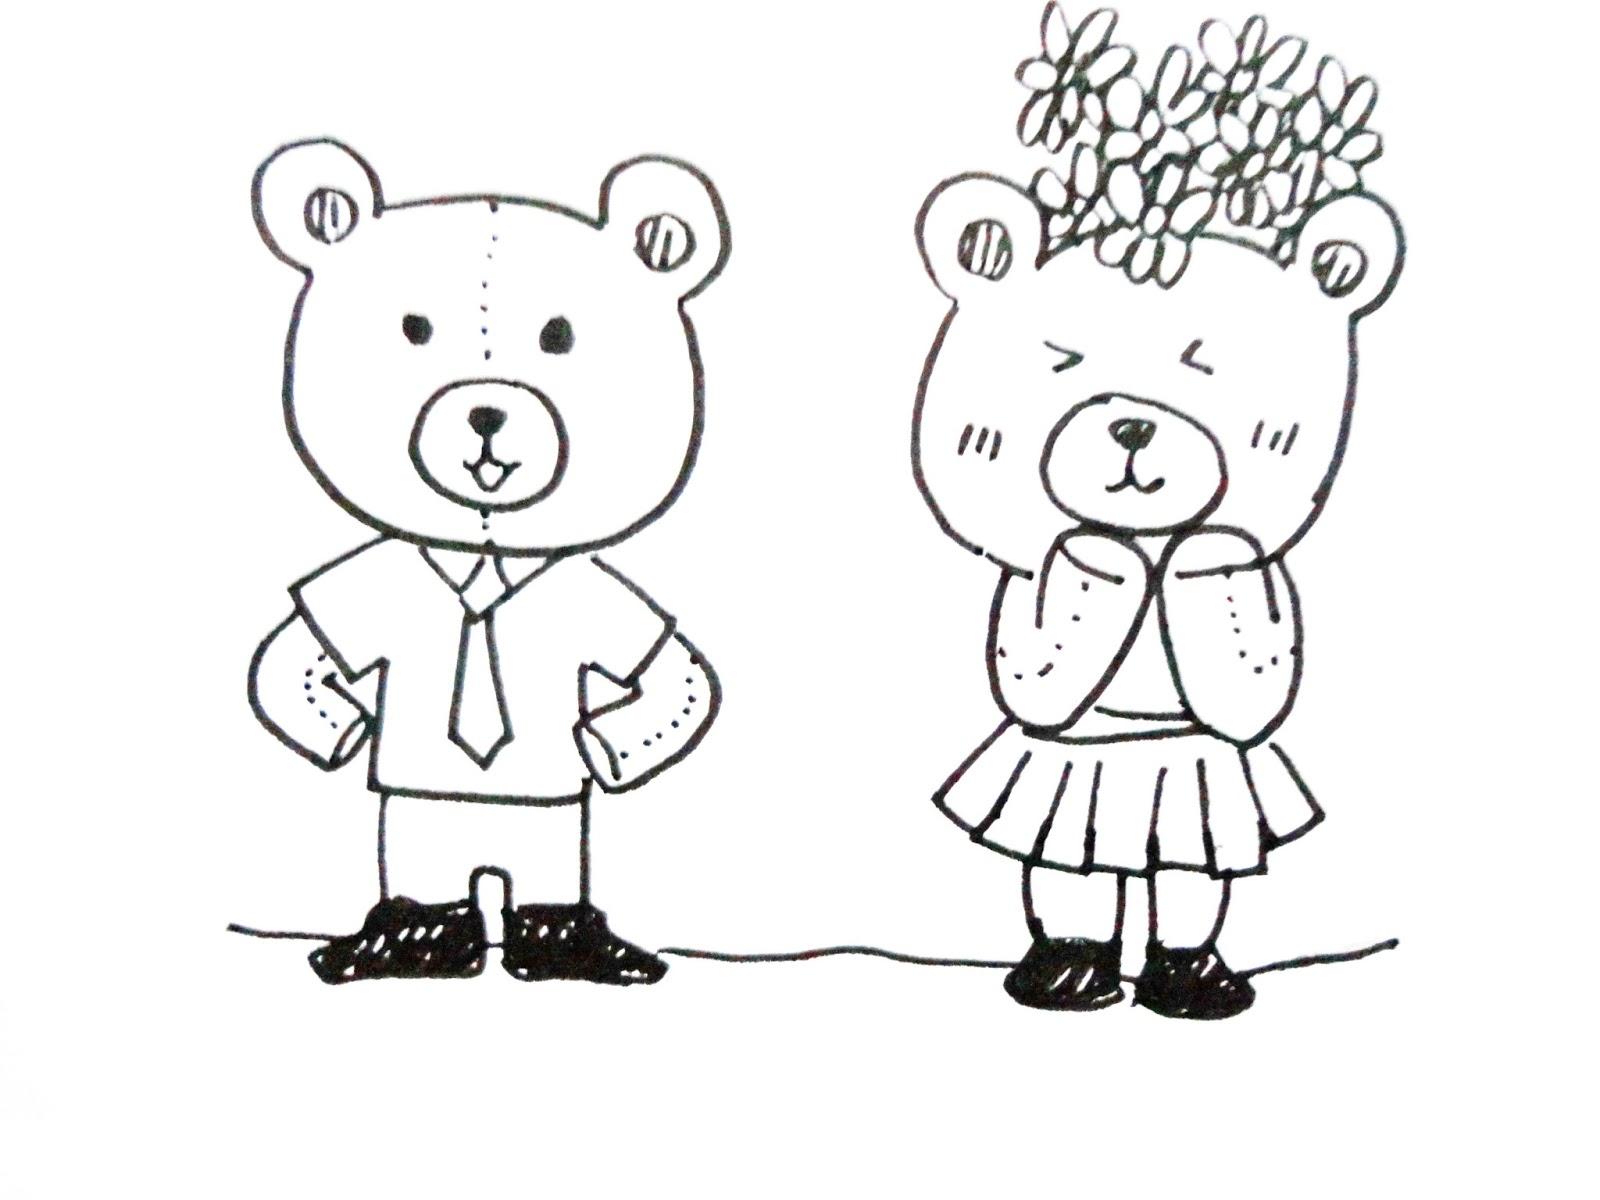 cartoon party animal drawing